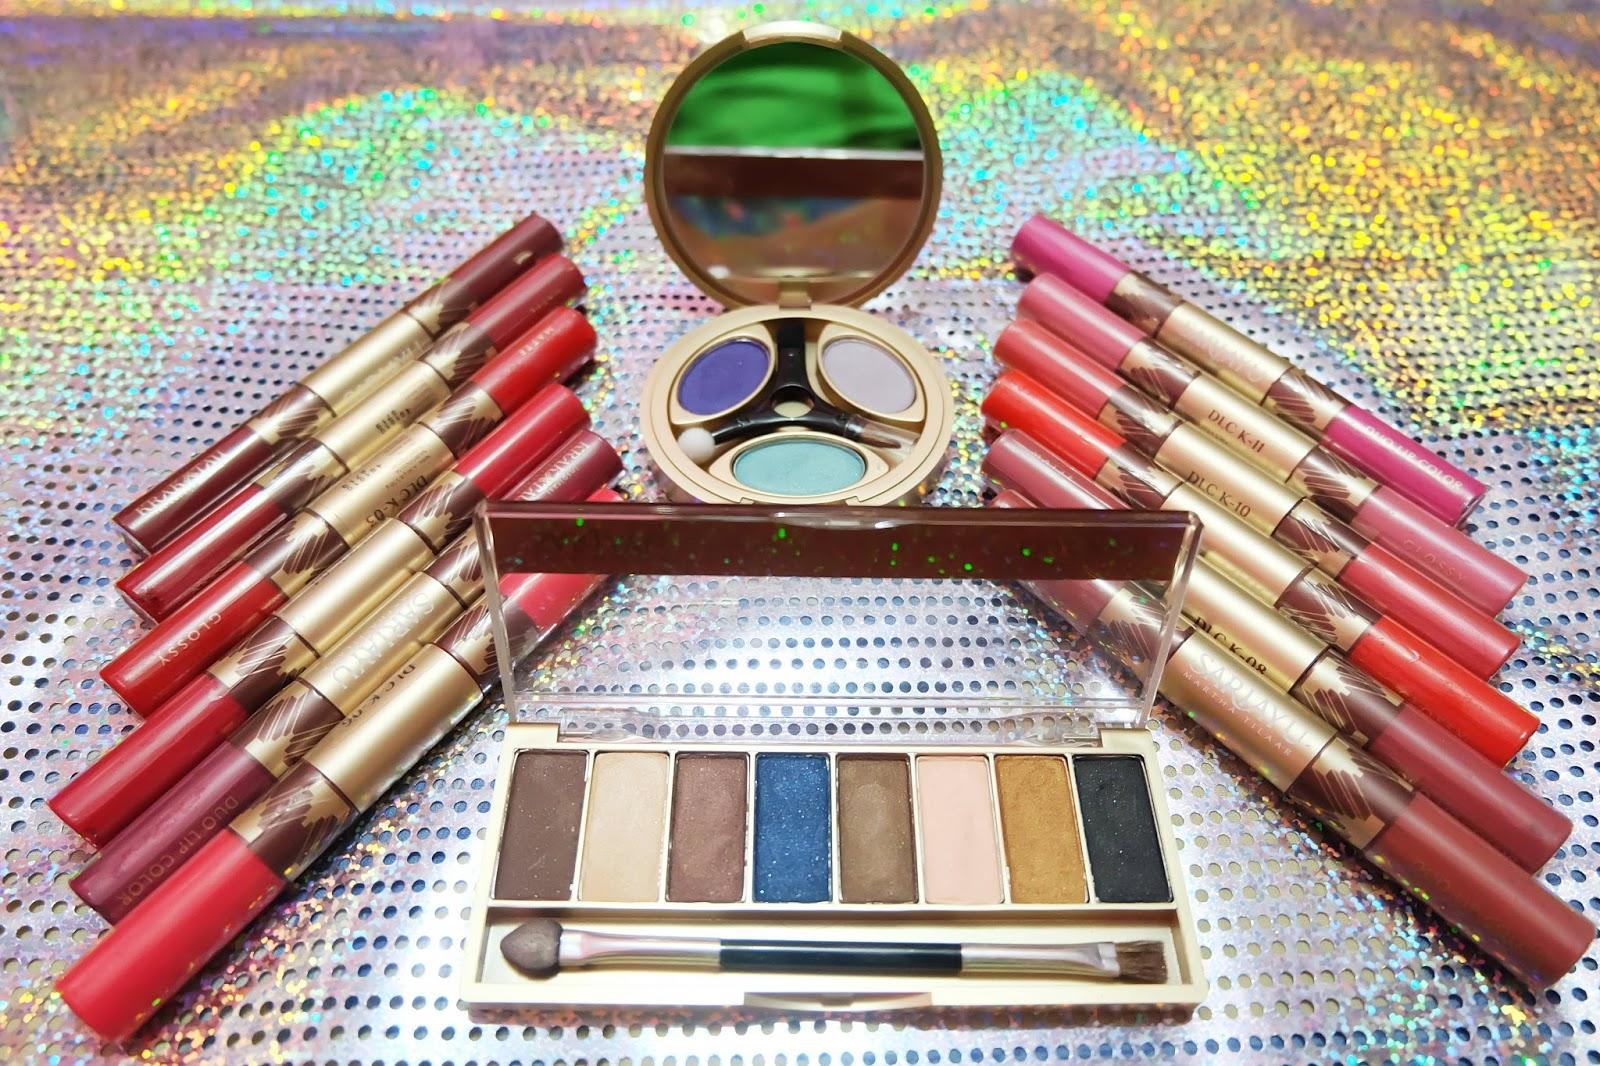 Color Trend Sariayu Martha Tilaar 16 Duo Lip K 10 So Ladies May I Present To You Tren Warna 2016 Inspirasi Krakatau